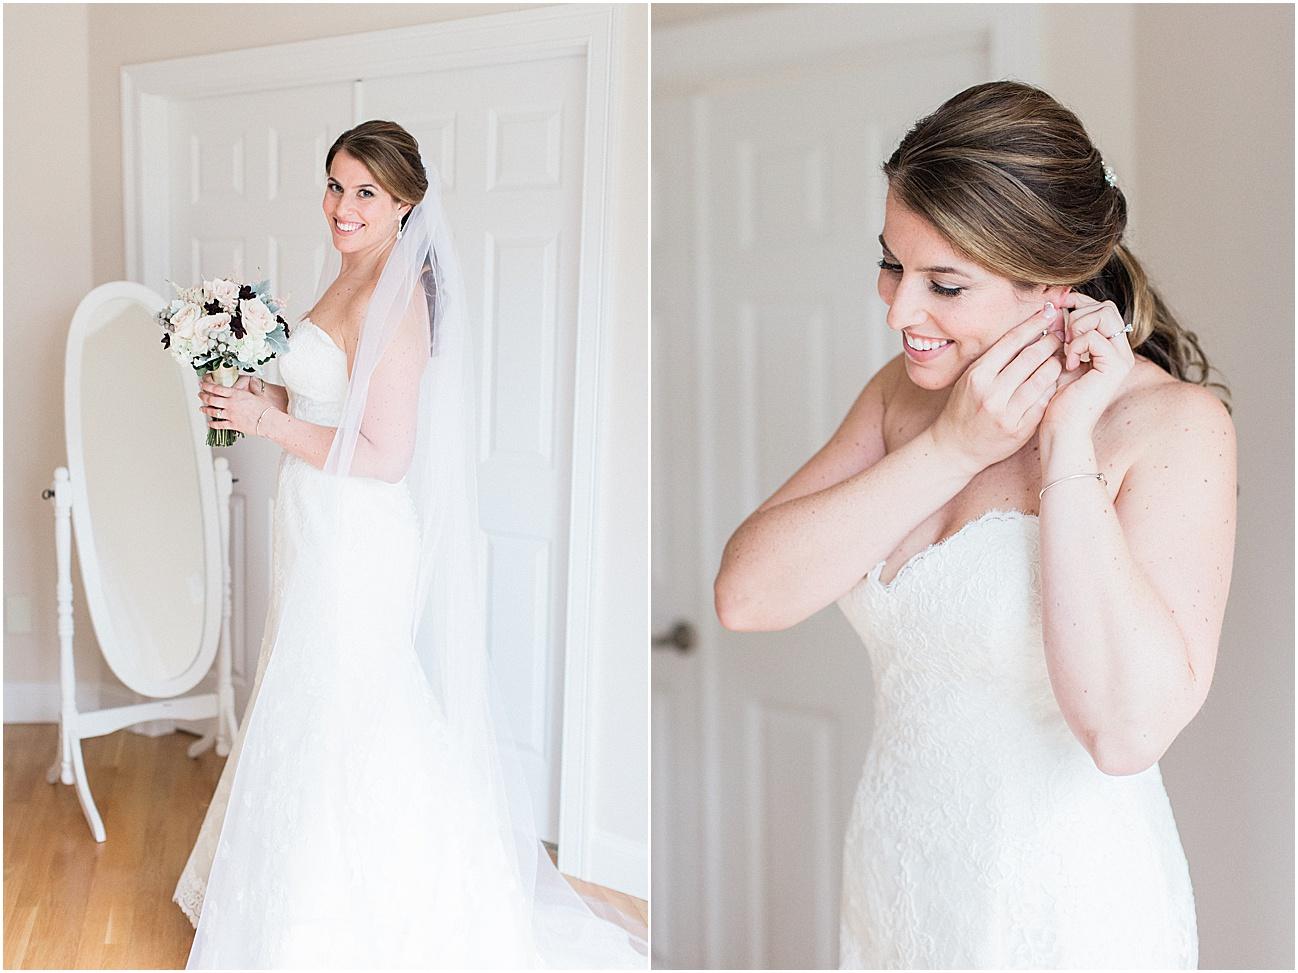 danielle_sean_willowbend_rain_rainy_day_cape_cod_boston_wedding_photographer_meredith_jane_photography_photo_1664.jpg